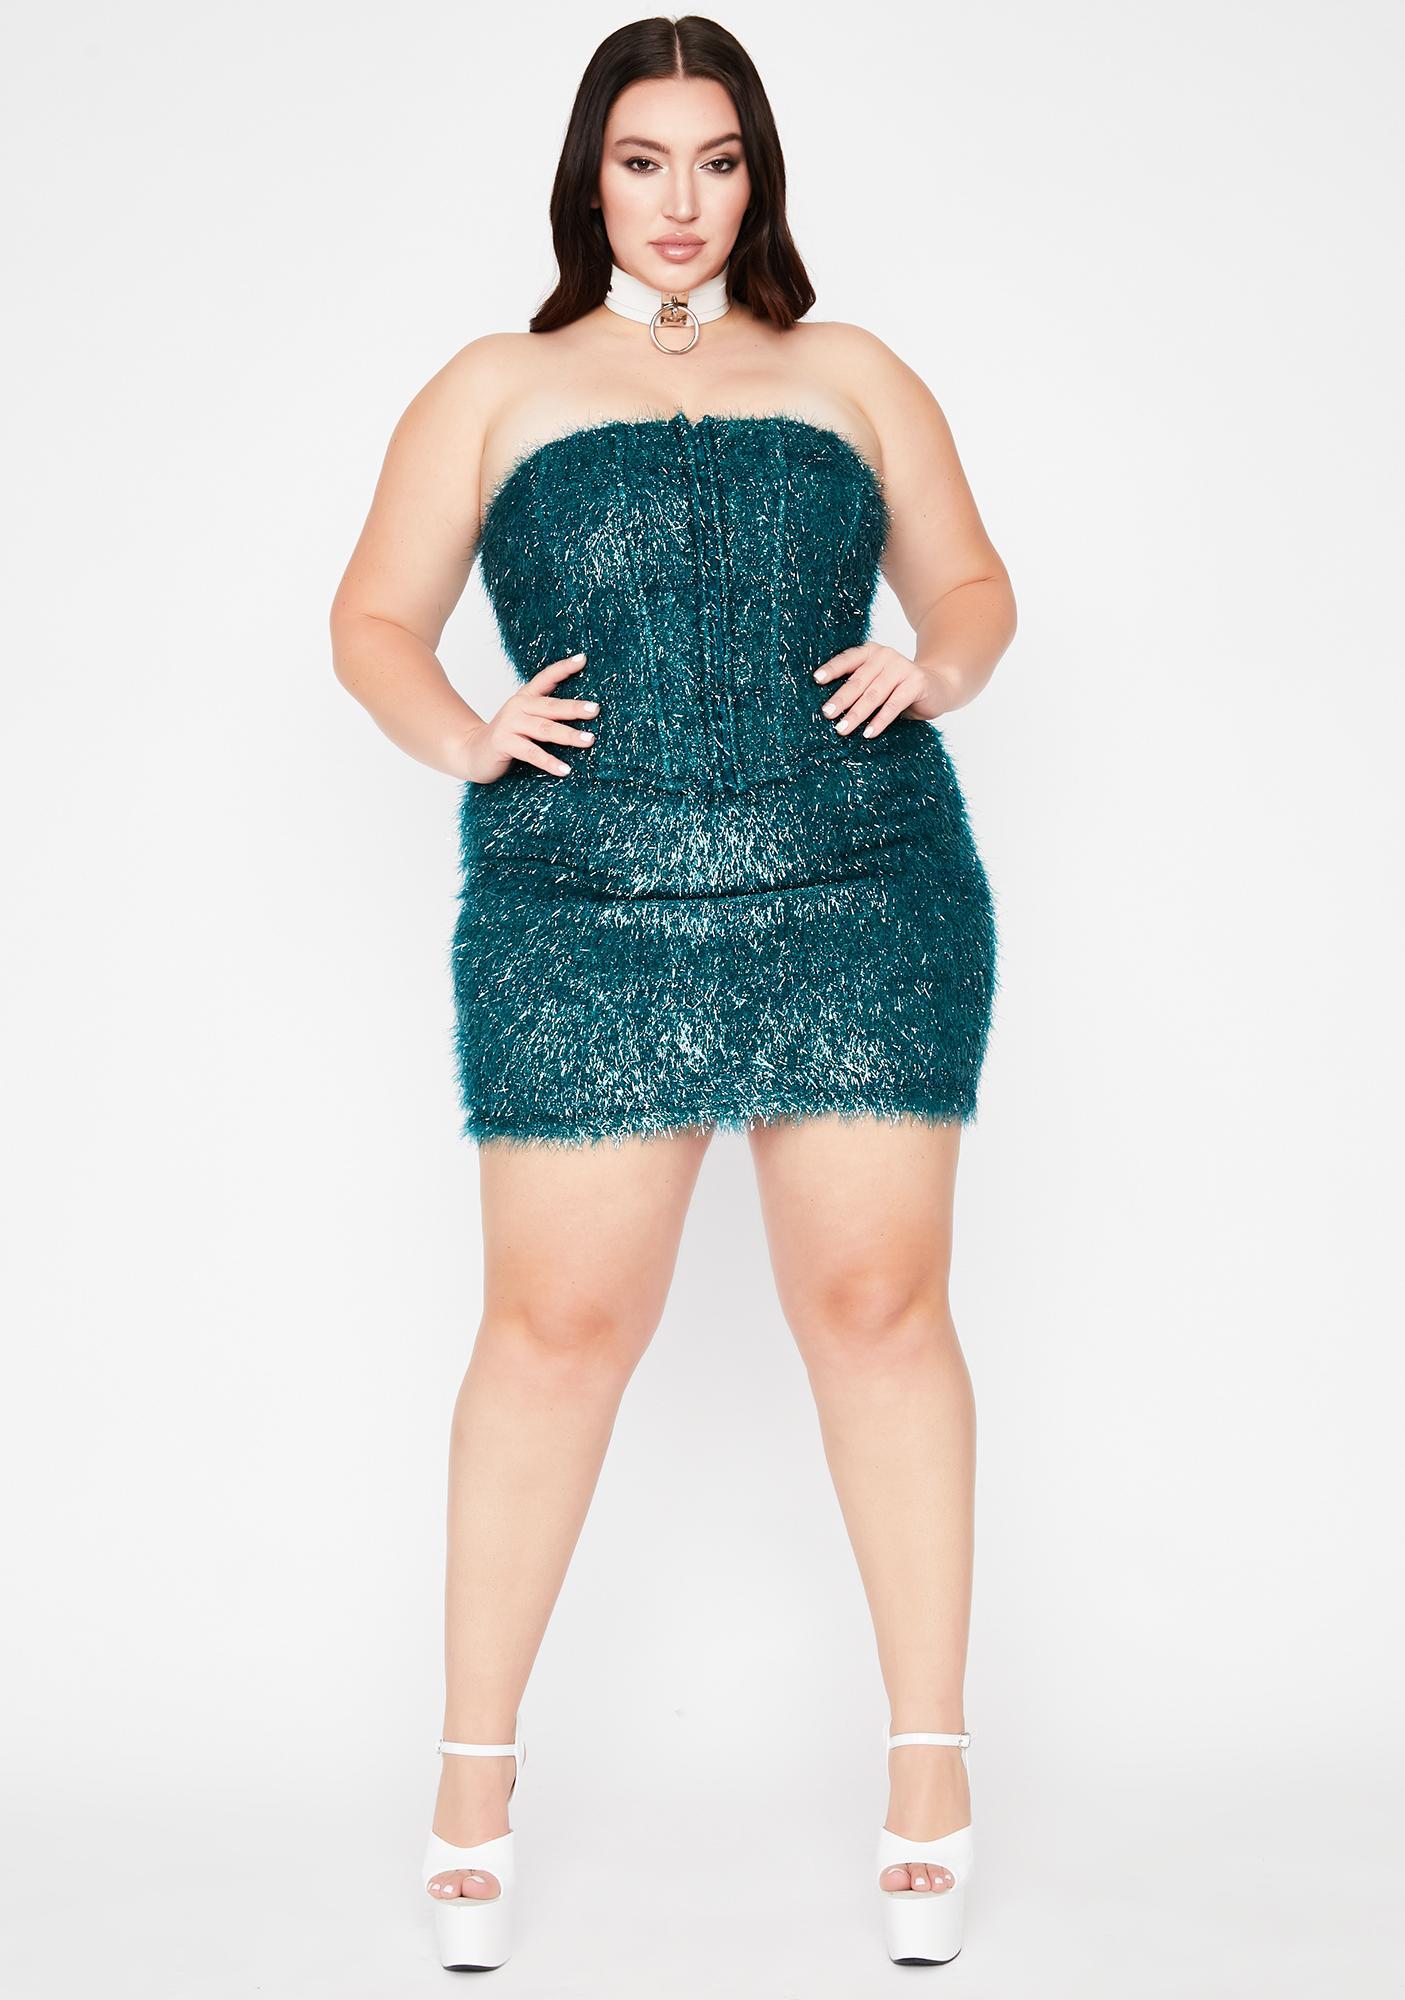 Jade Let's Dance All Night Fringe Corset